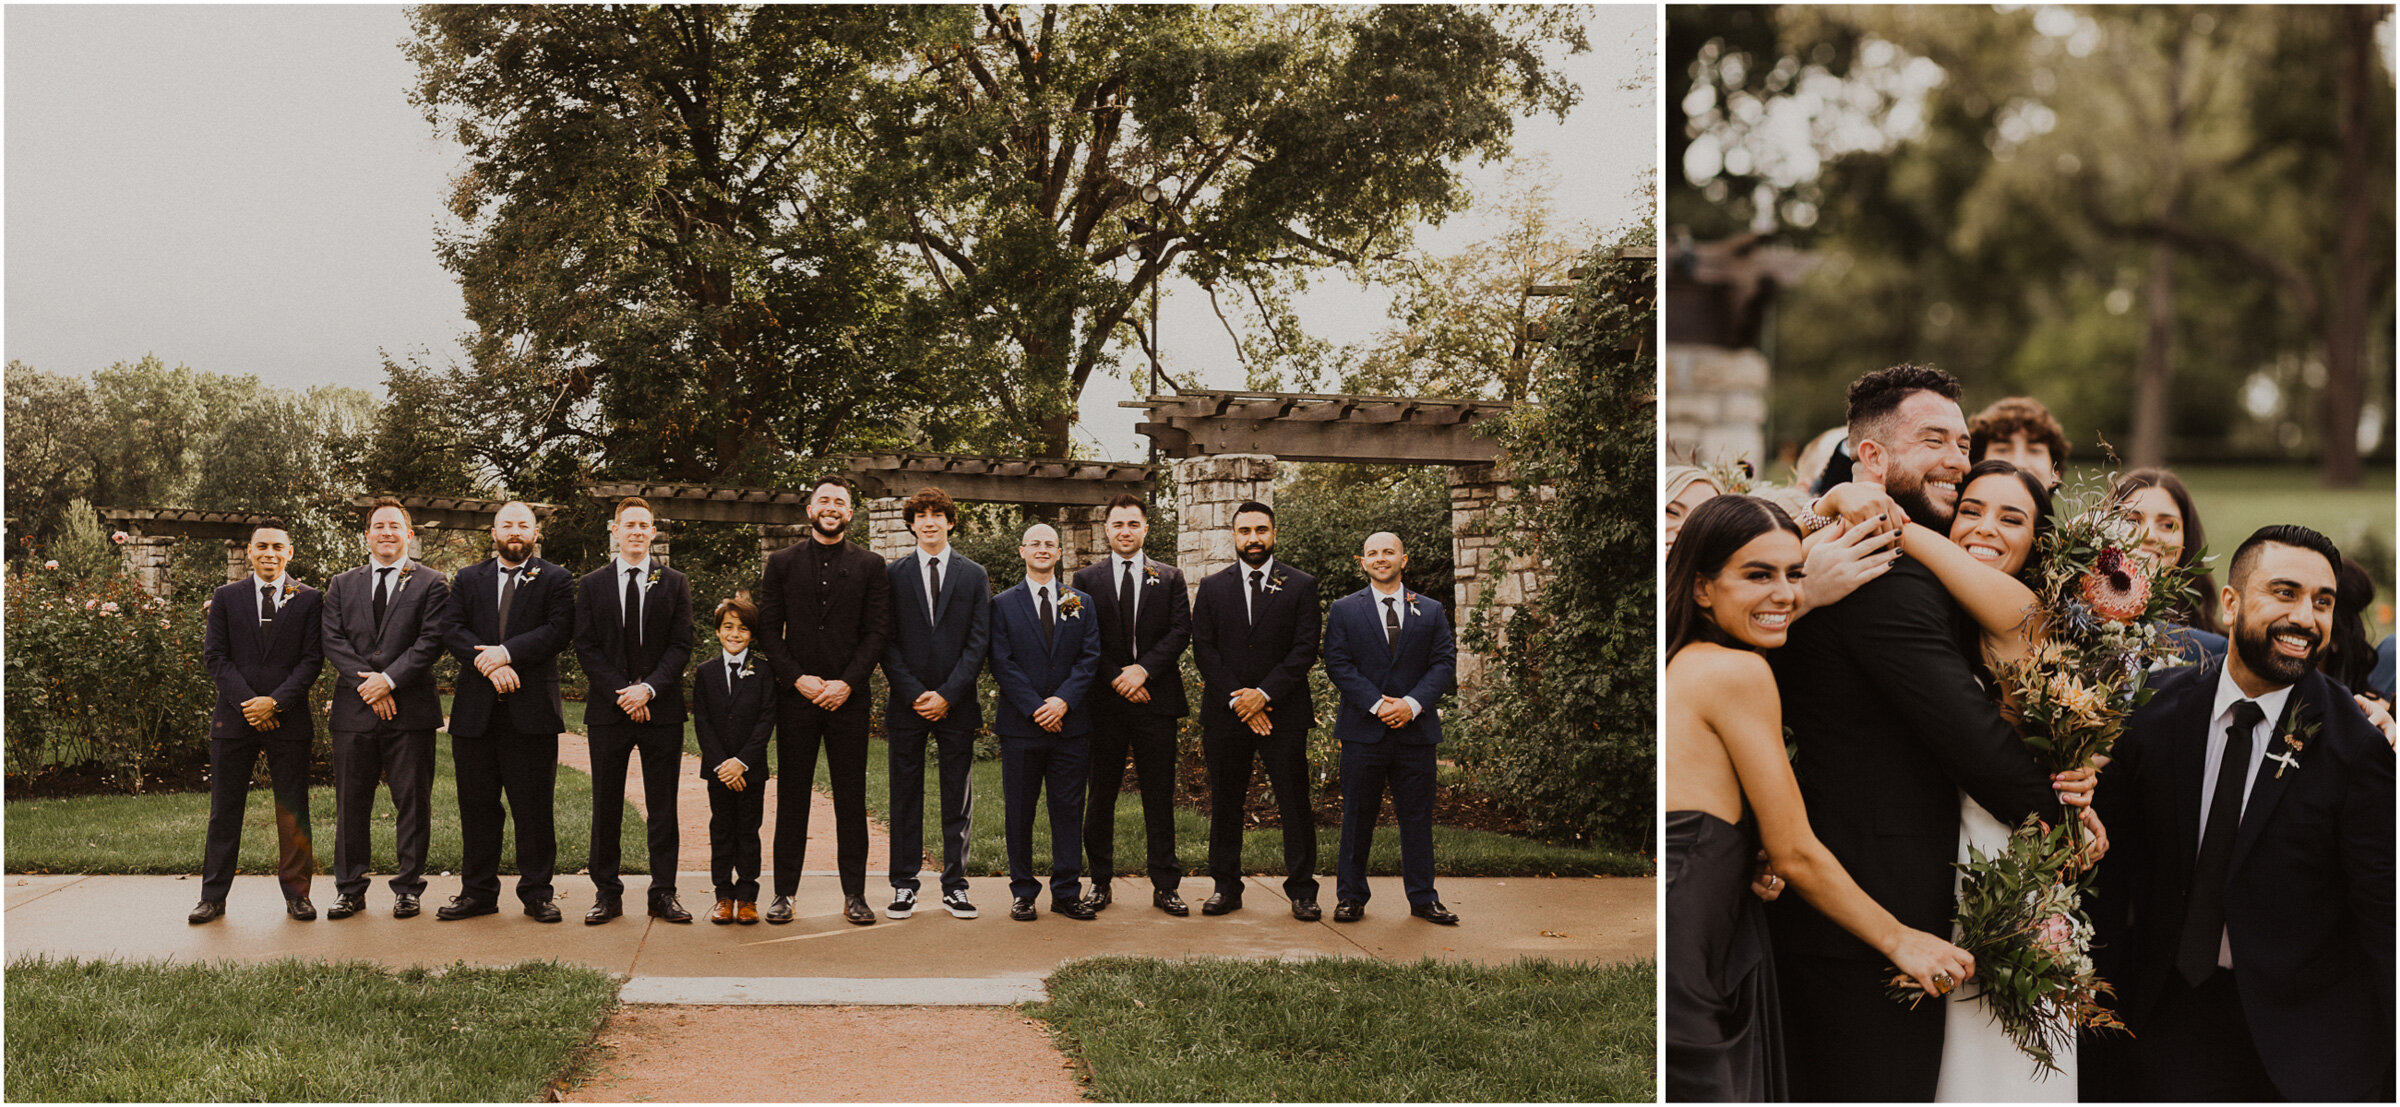 alyssa barletter photography la villa kansas city patio wedding sarah seven wedding dress-19.jpg